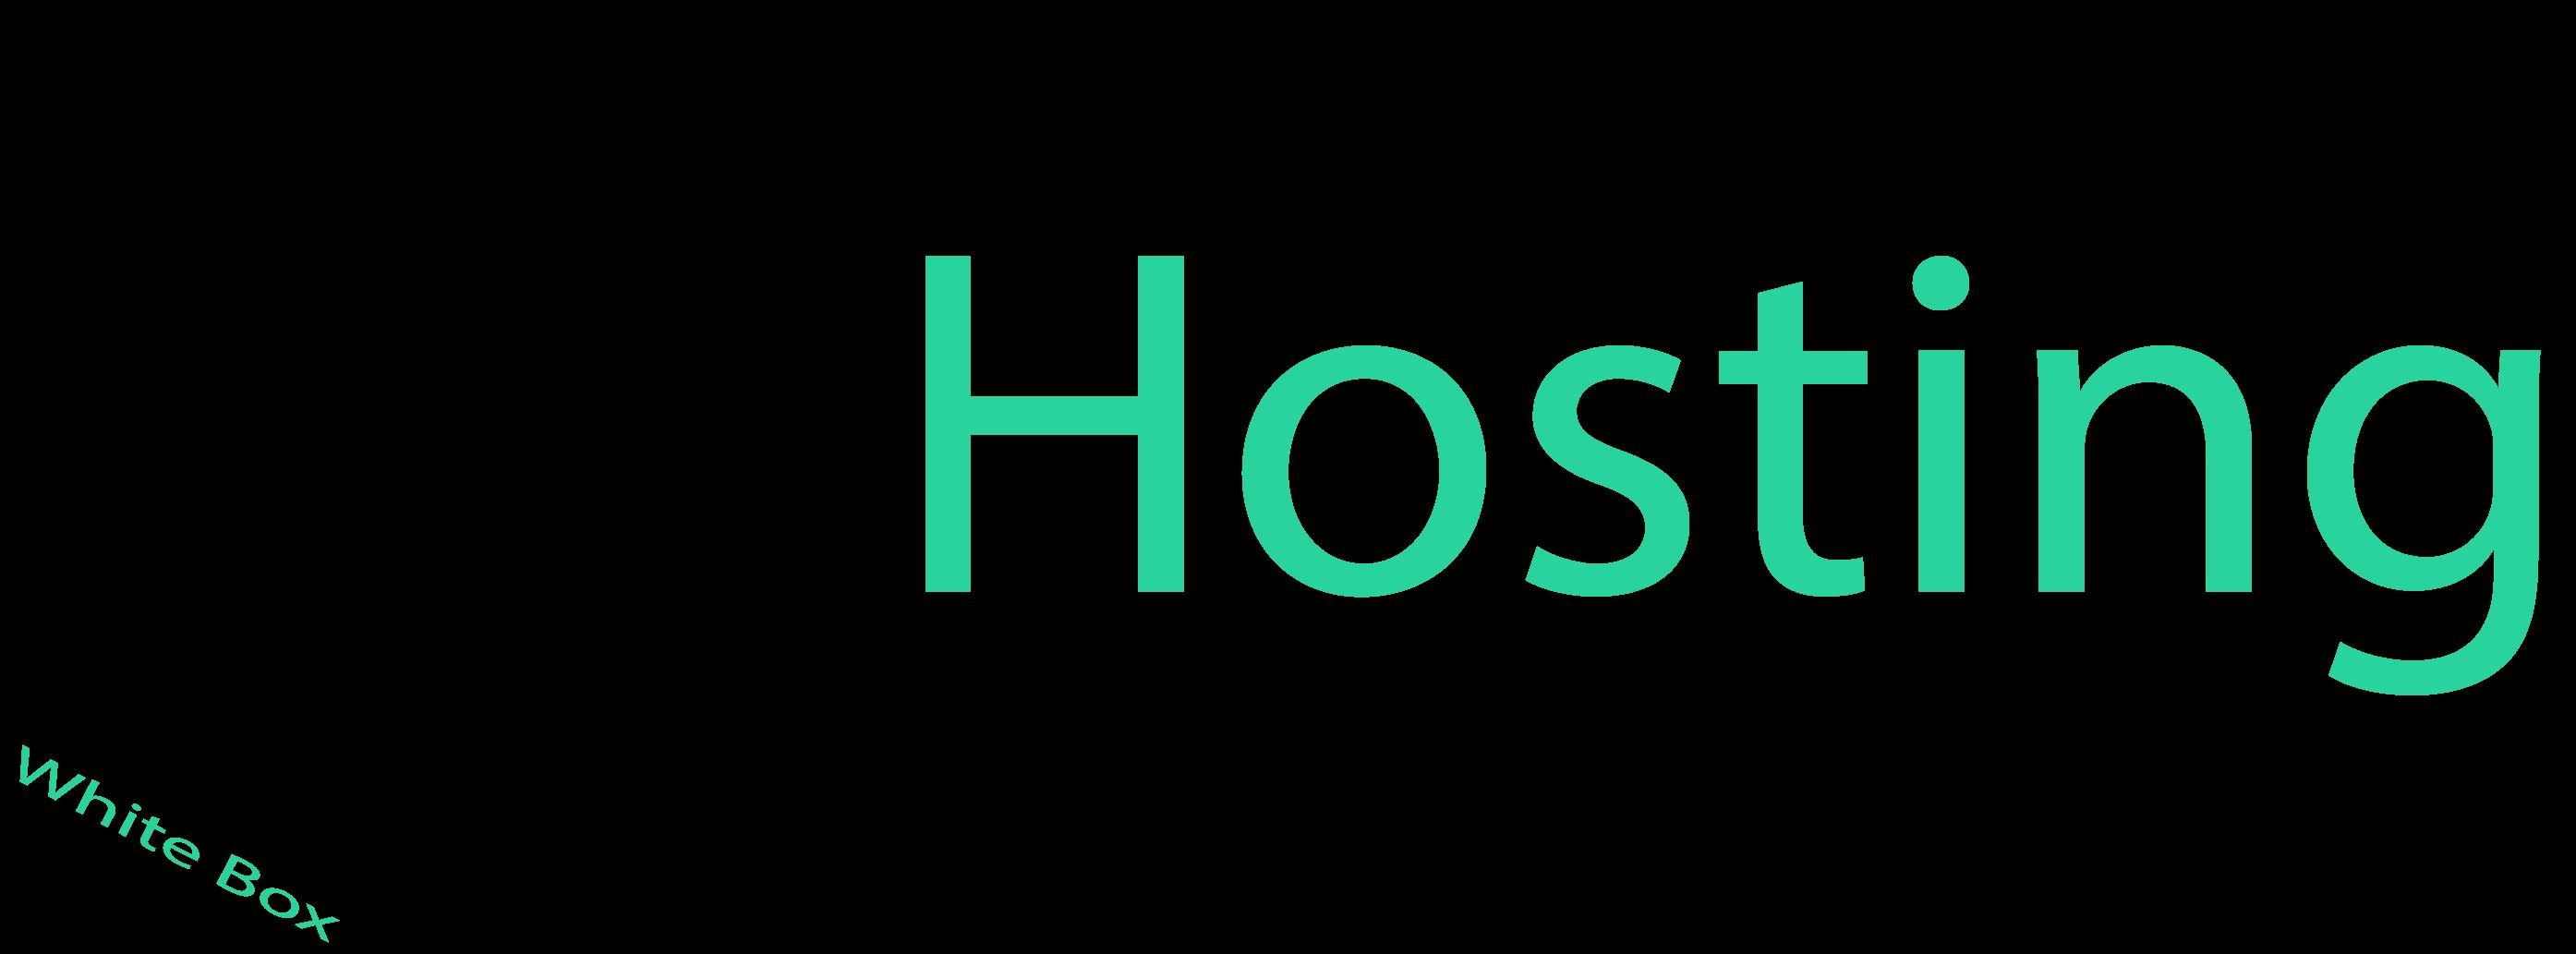 White Box Hosting